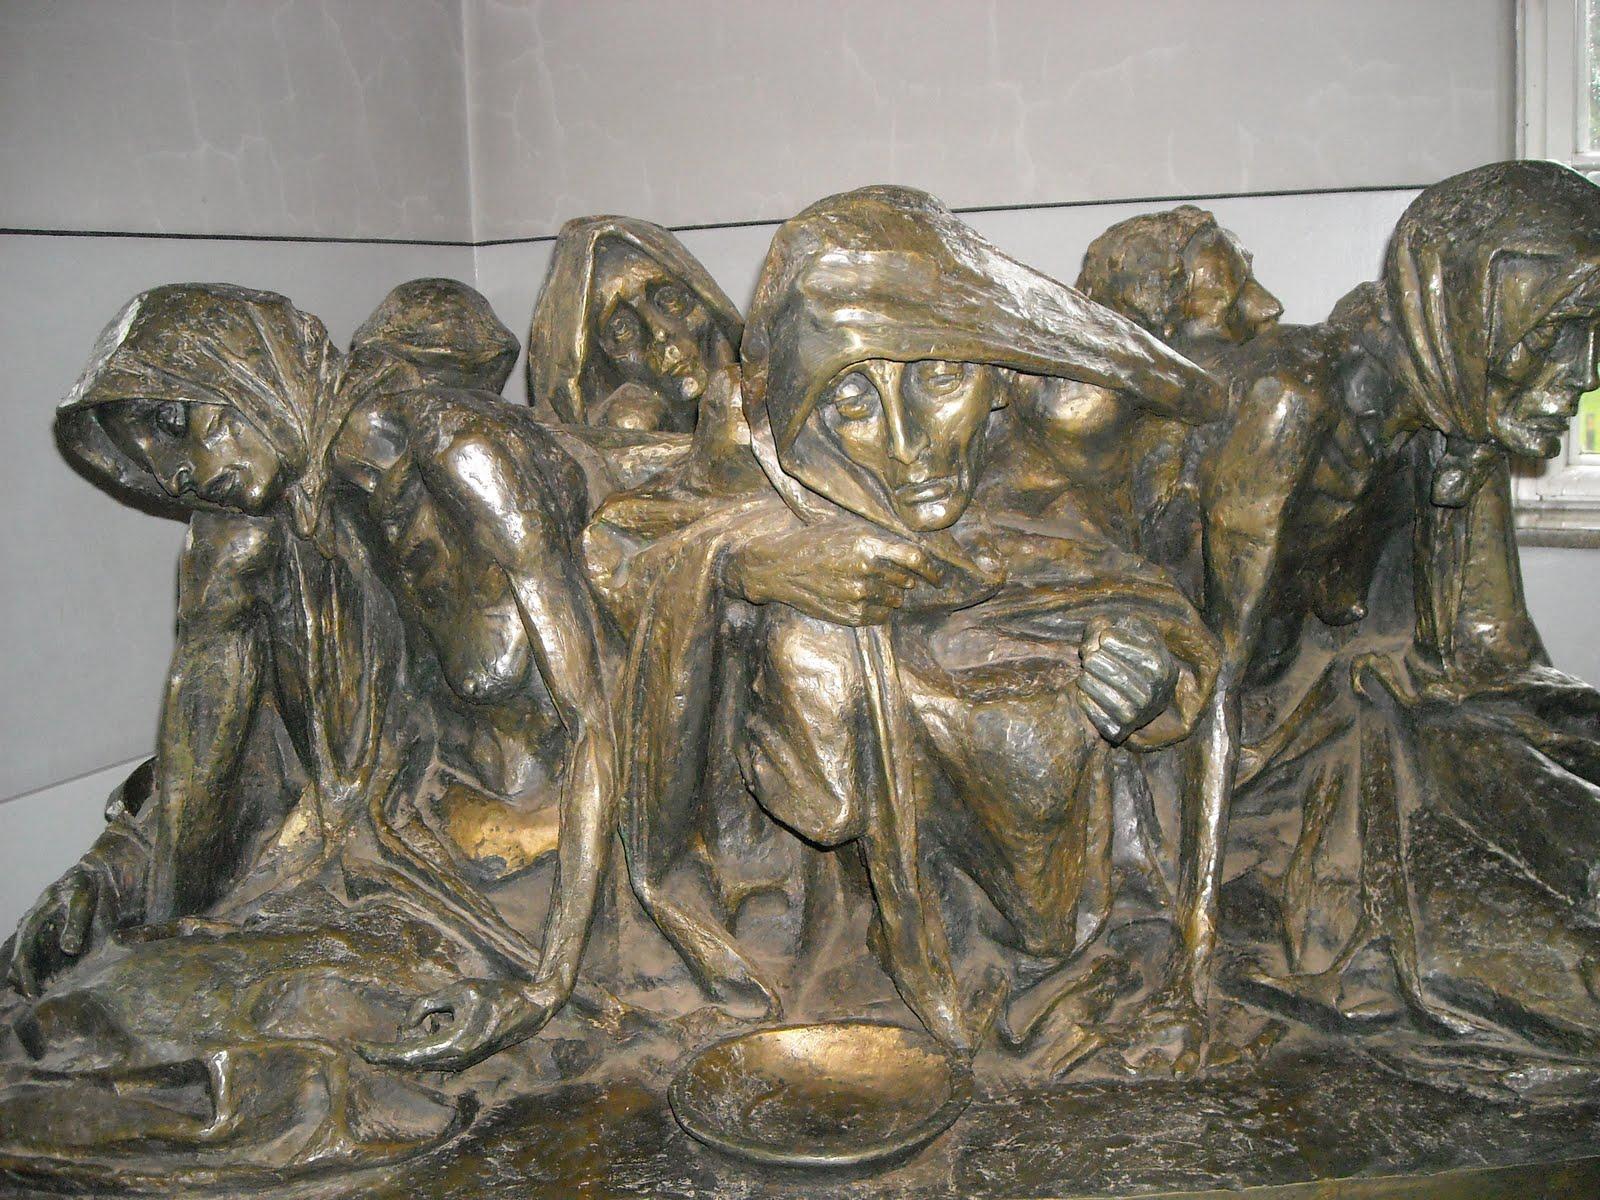 estatua de mujeres sufriendo fondo